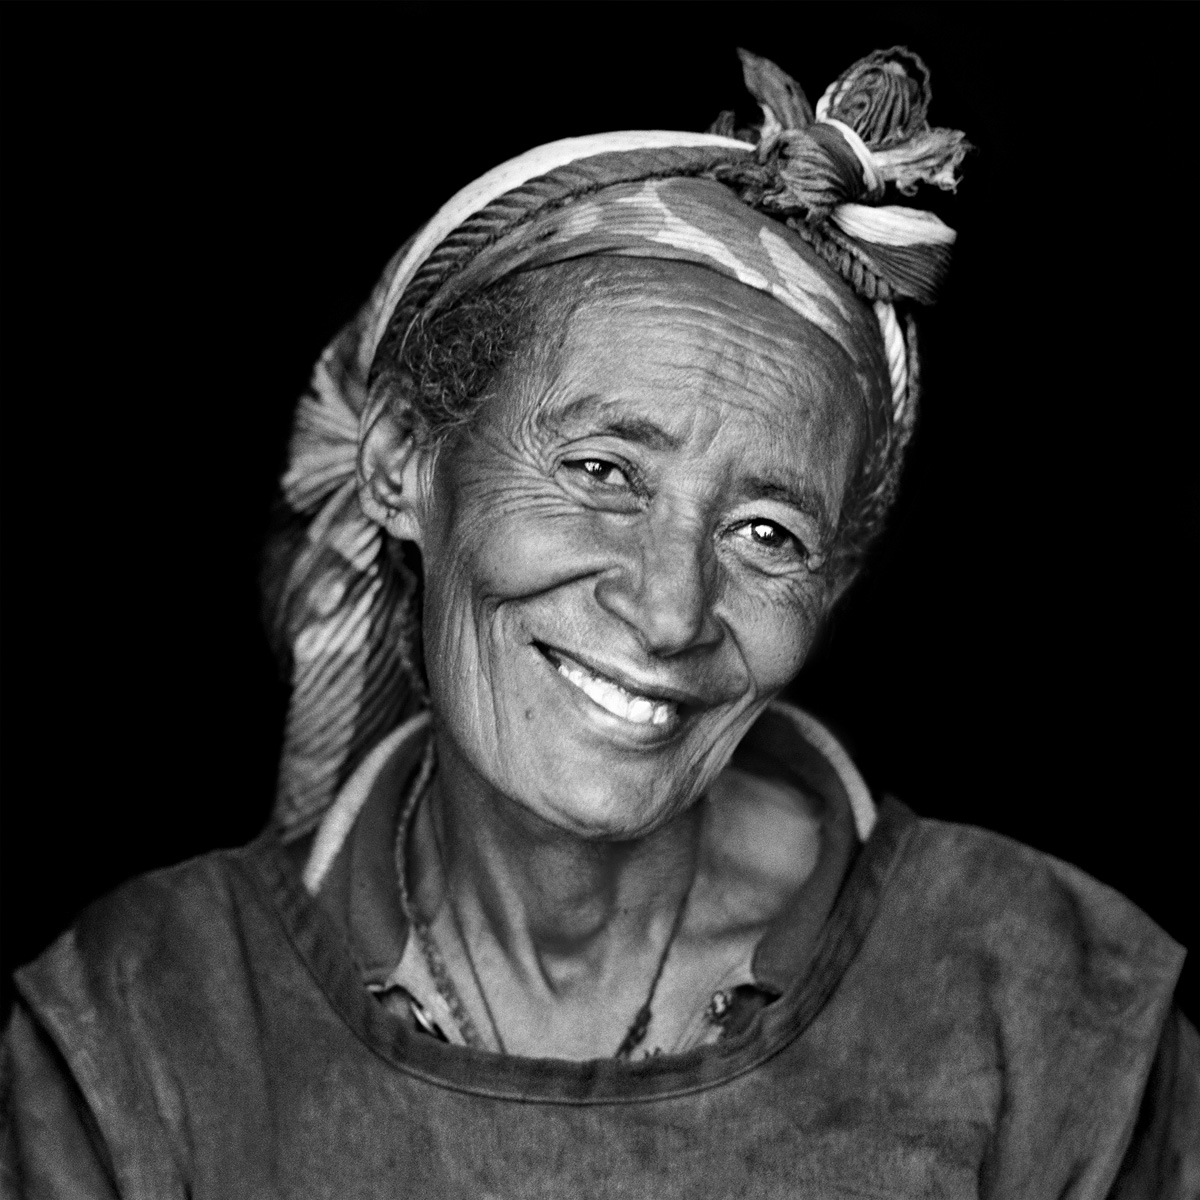 © Christine Turnauer - Worlid, coal merchant, Gondar Market, Ethiopia, 2011, Coal pigment print